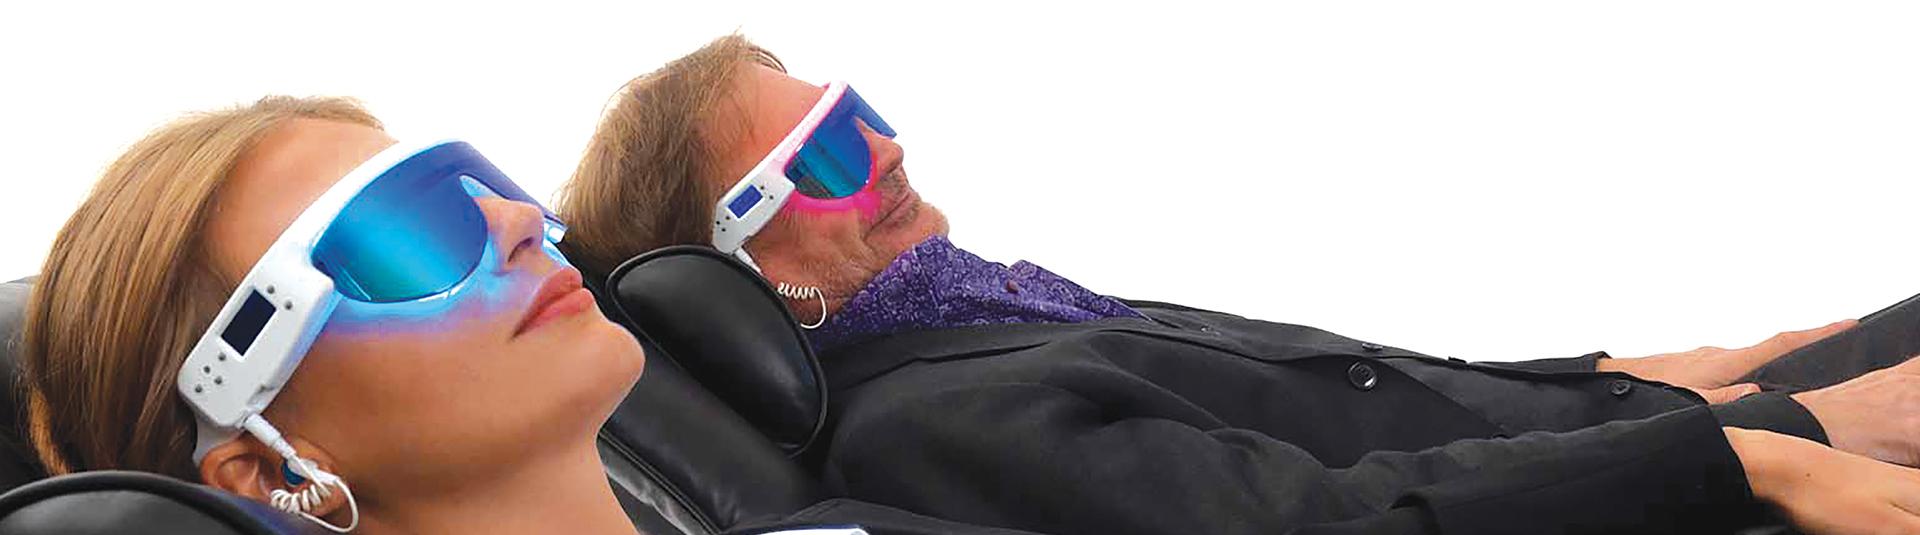 Luminoterapia Gafas PSIO - Zenfácil